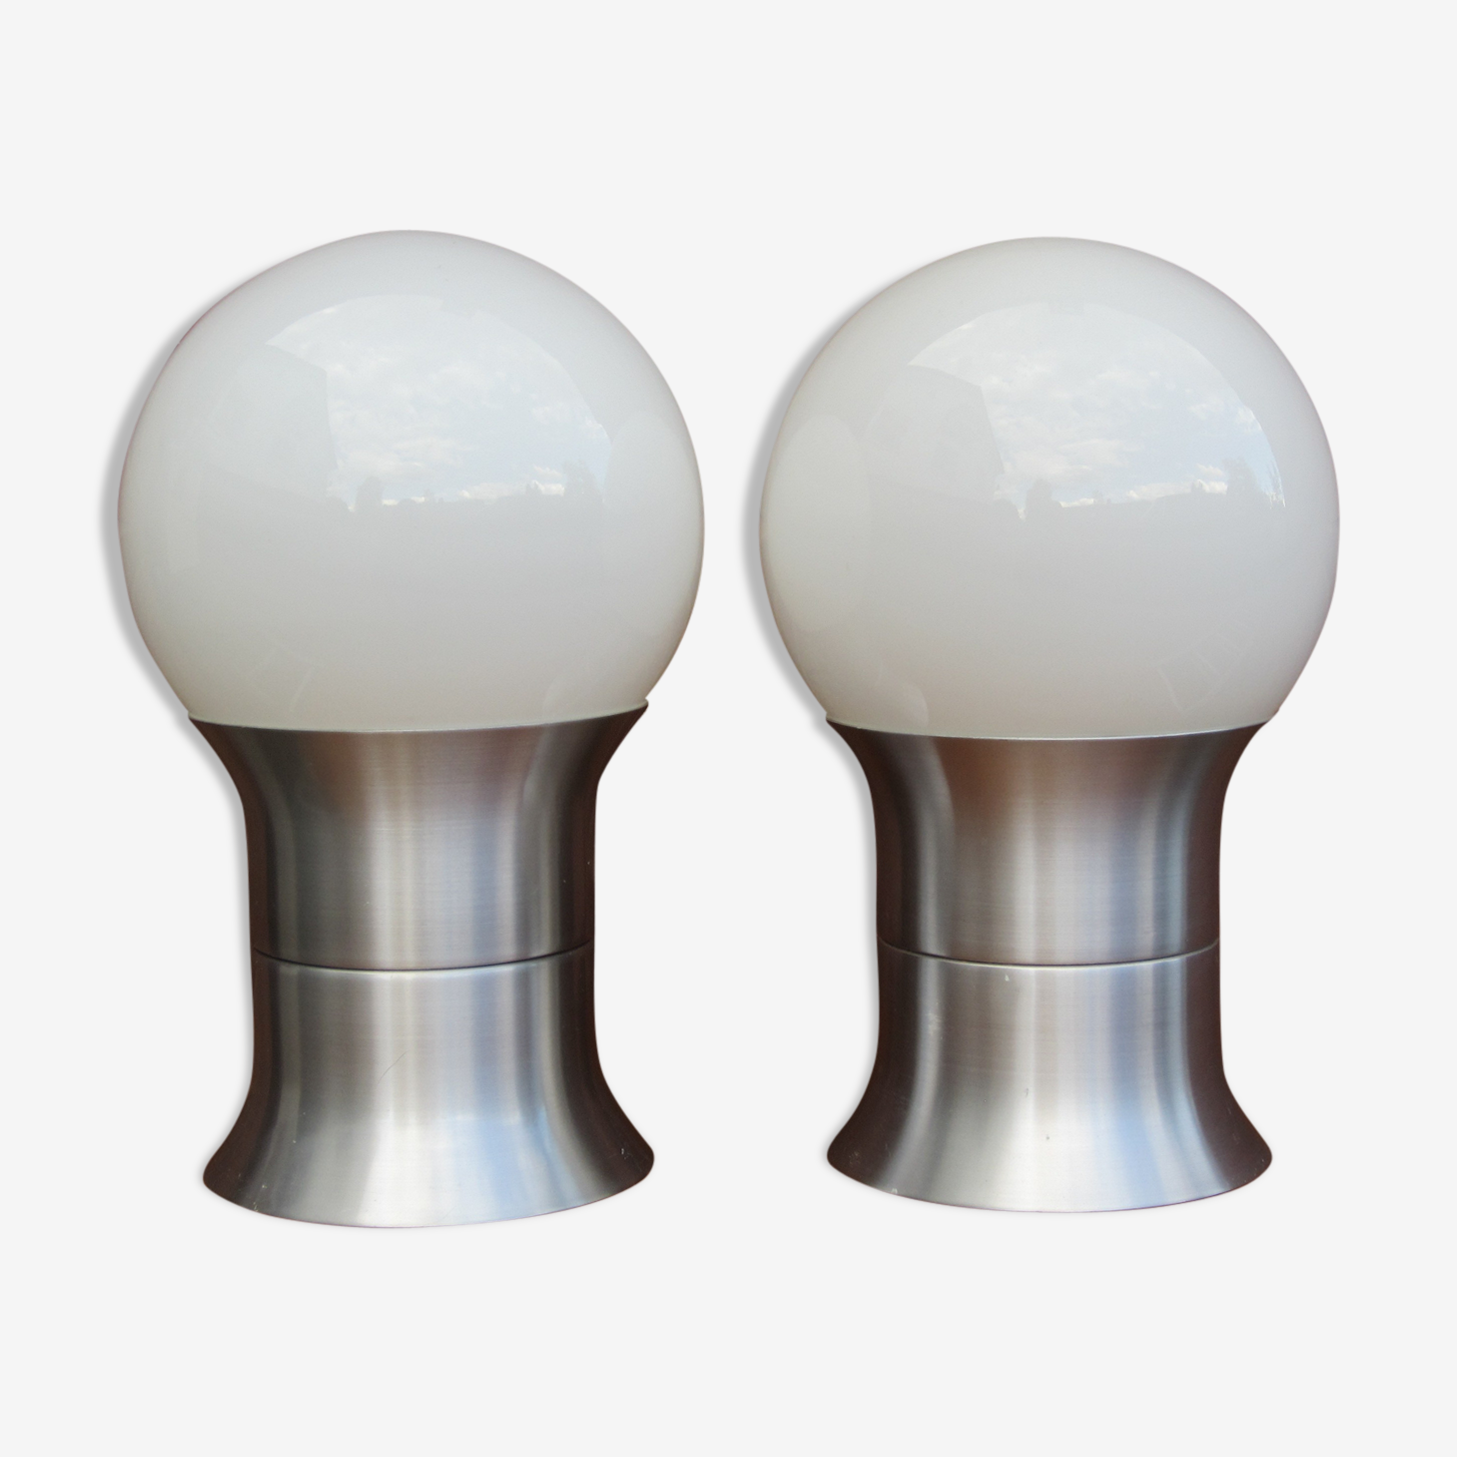 Lampes scandinaves Hemi Klot 2